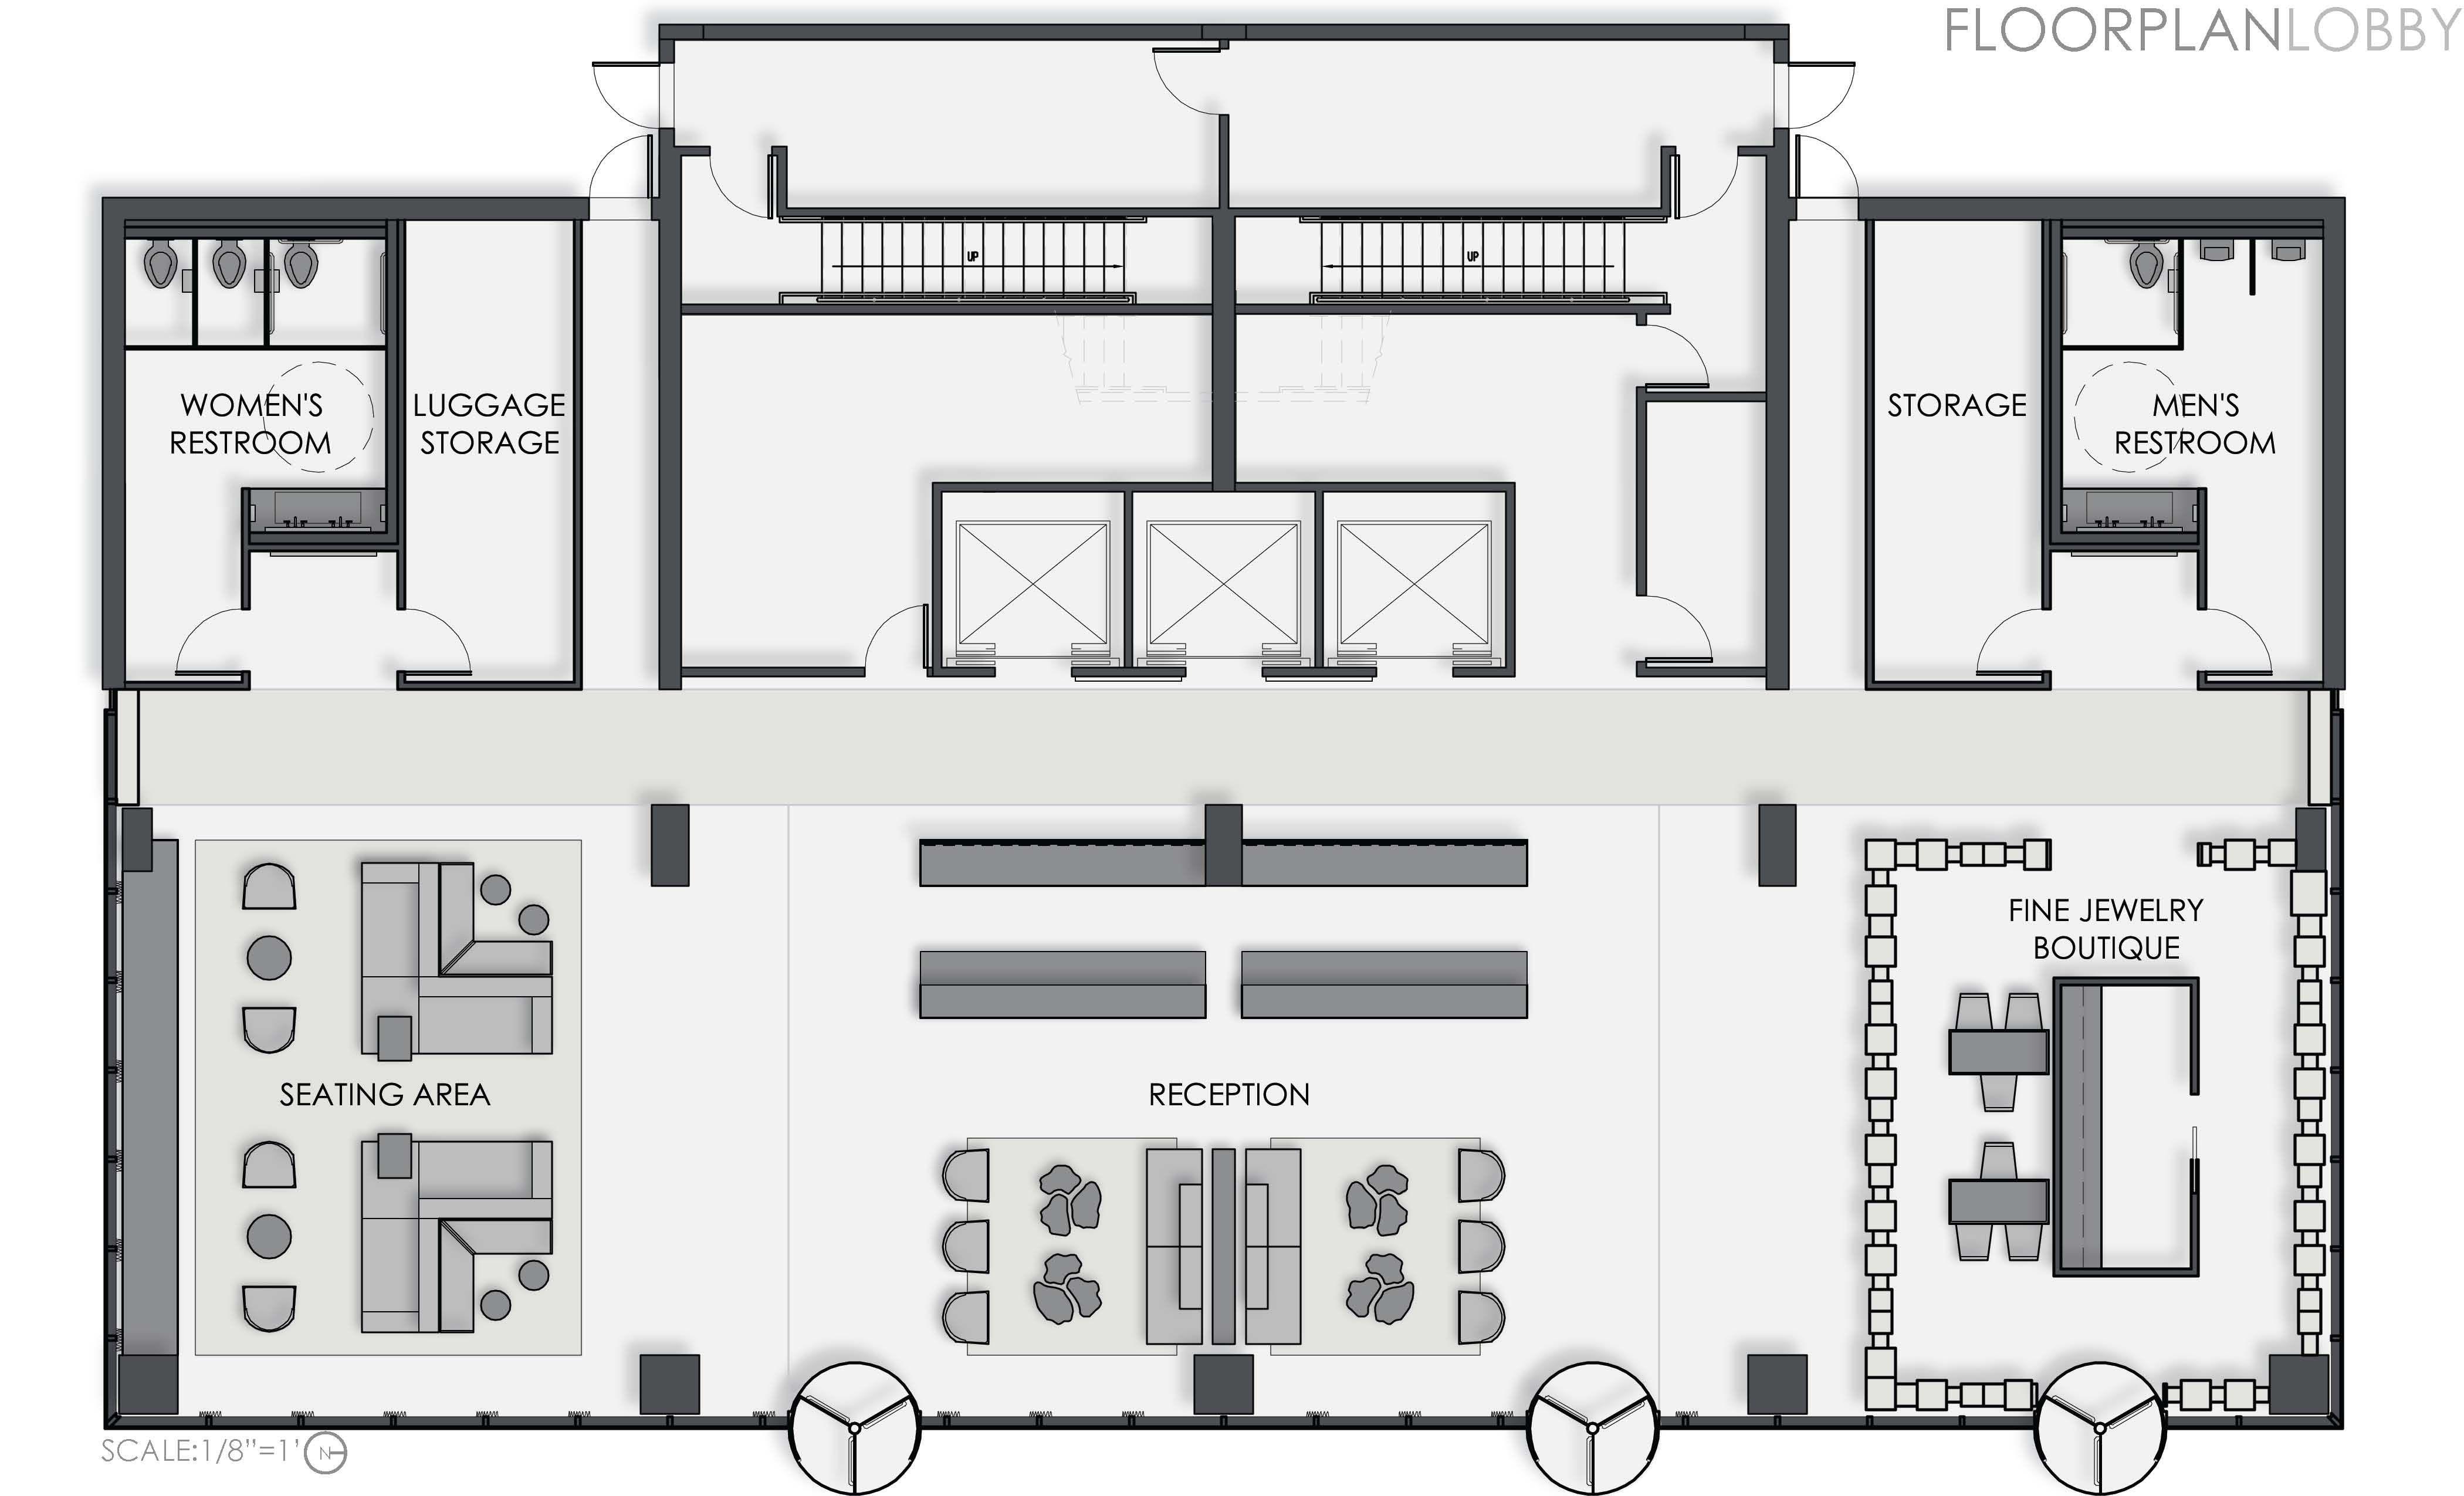 Hotel lobby furniture plan - Gallery Of Hotel Lobby Furniture Floor Plan